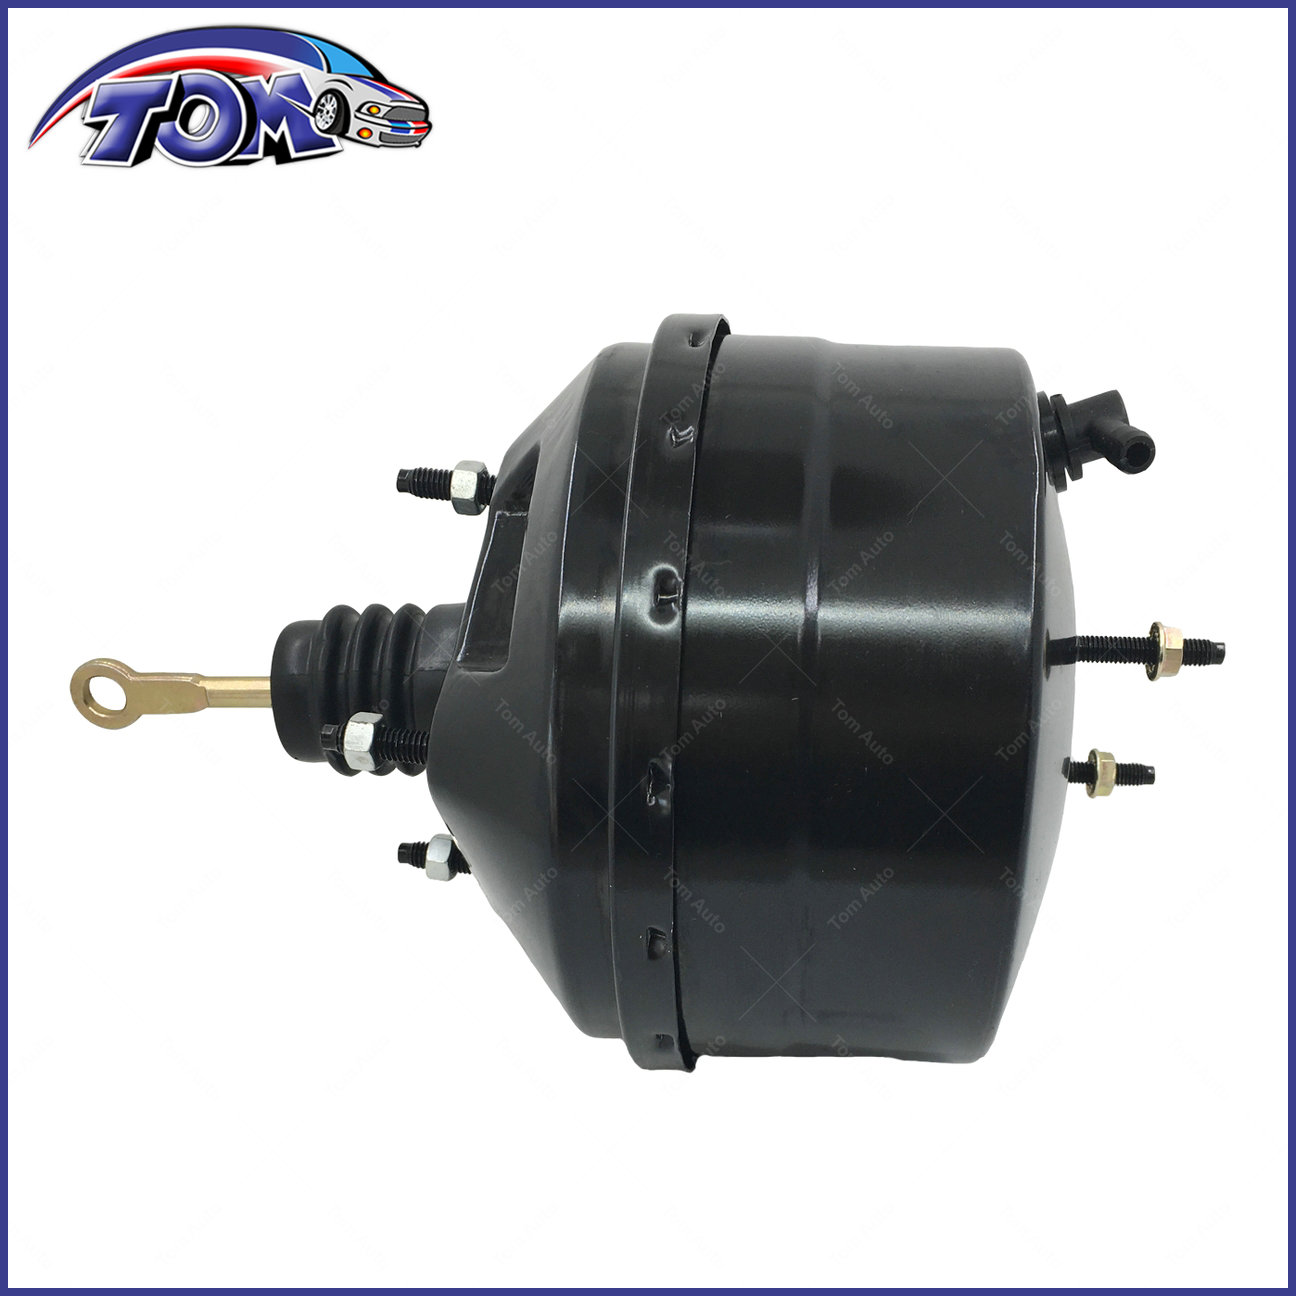 Stone 8943242000 Engine Oil Pan Gasket